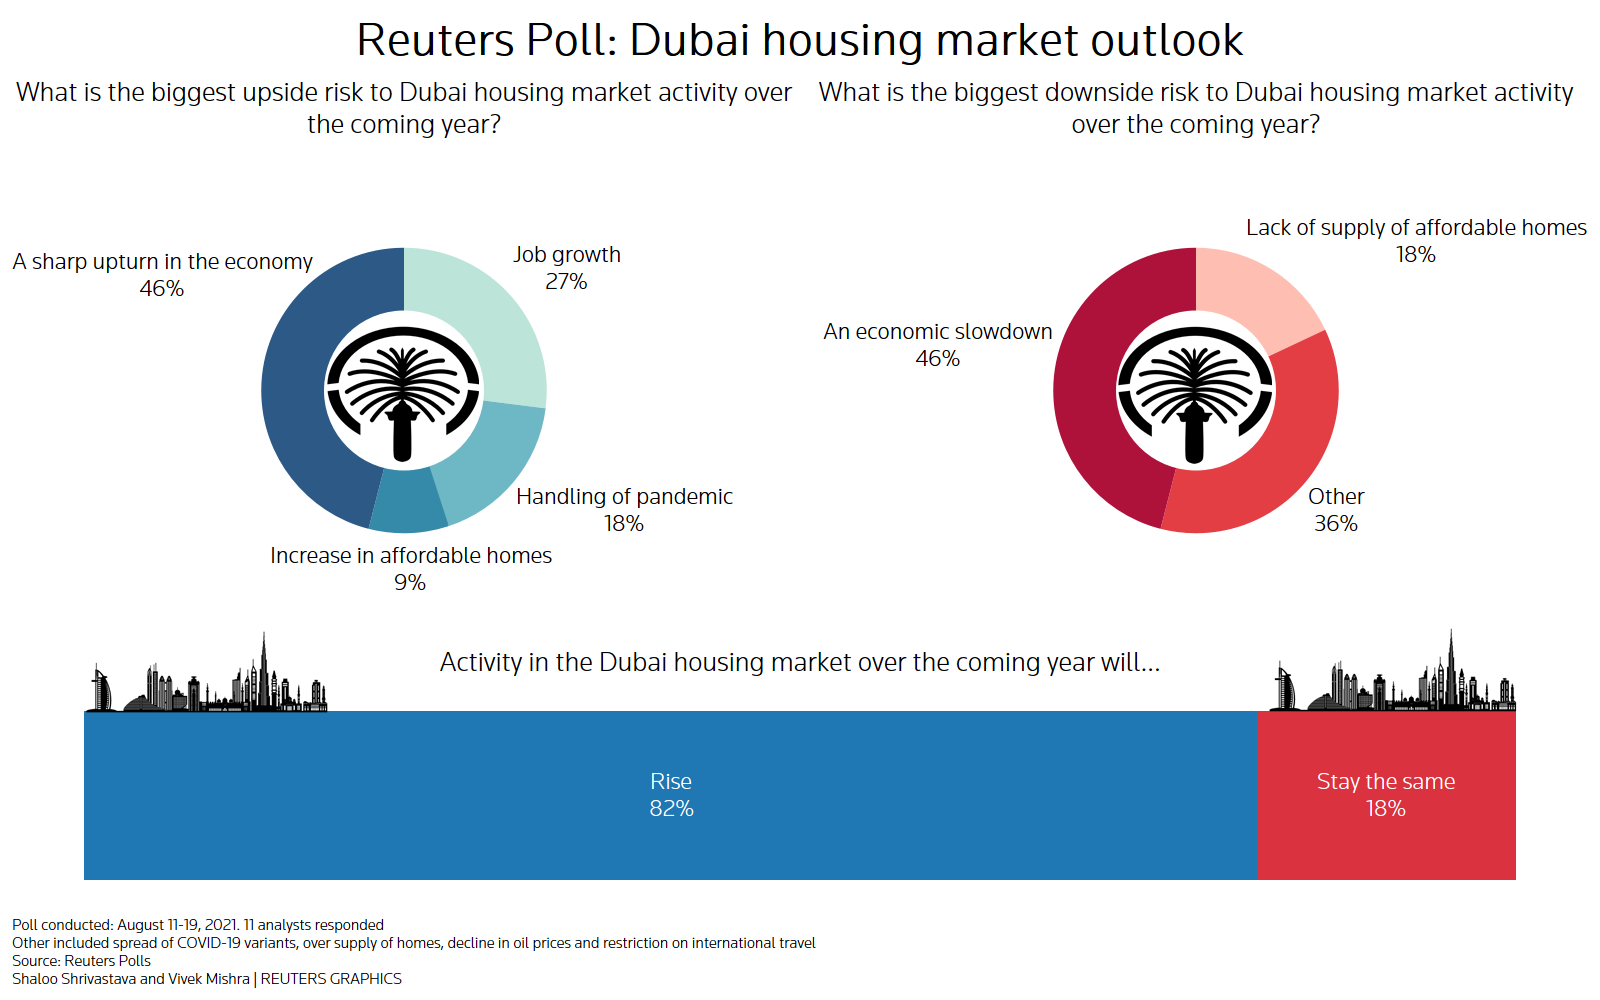 Reuters poll graphics on the Dubai housing market outlook: